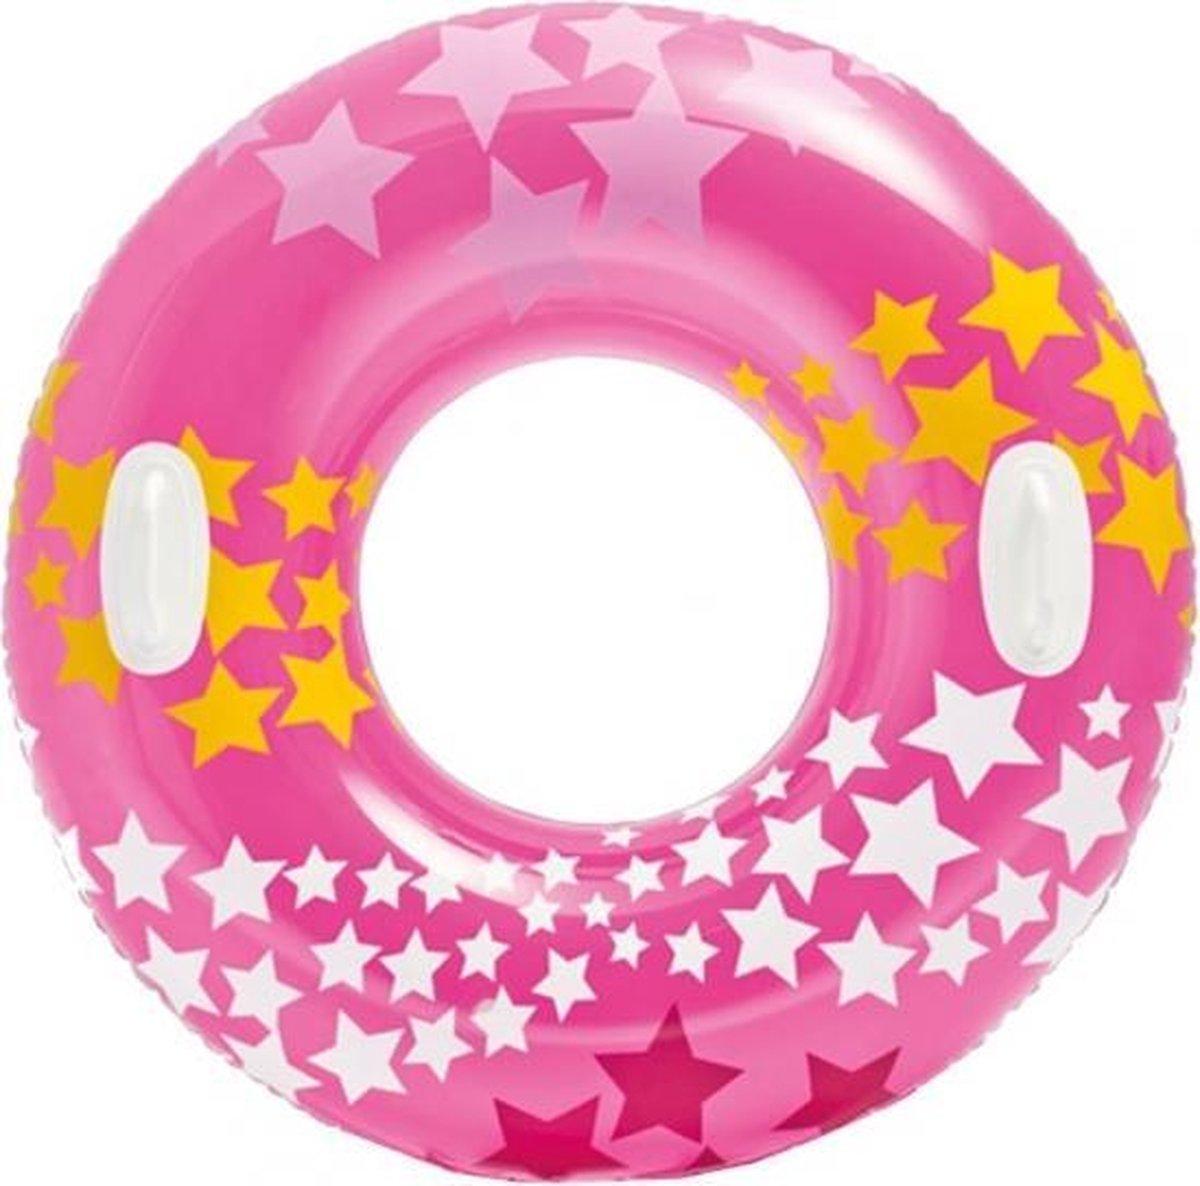 Intex Zwemband Stargaze 91 Cm Roze